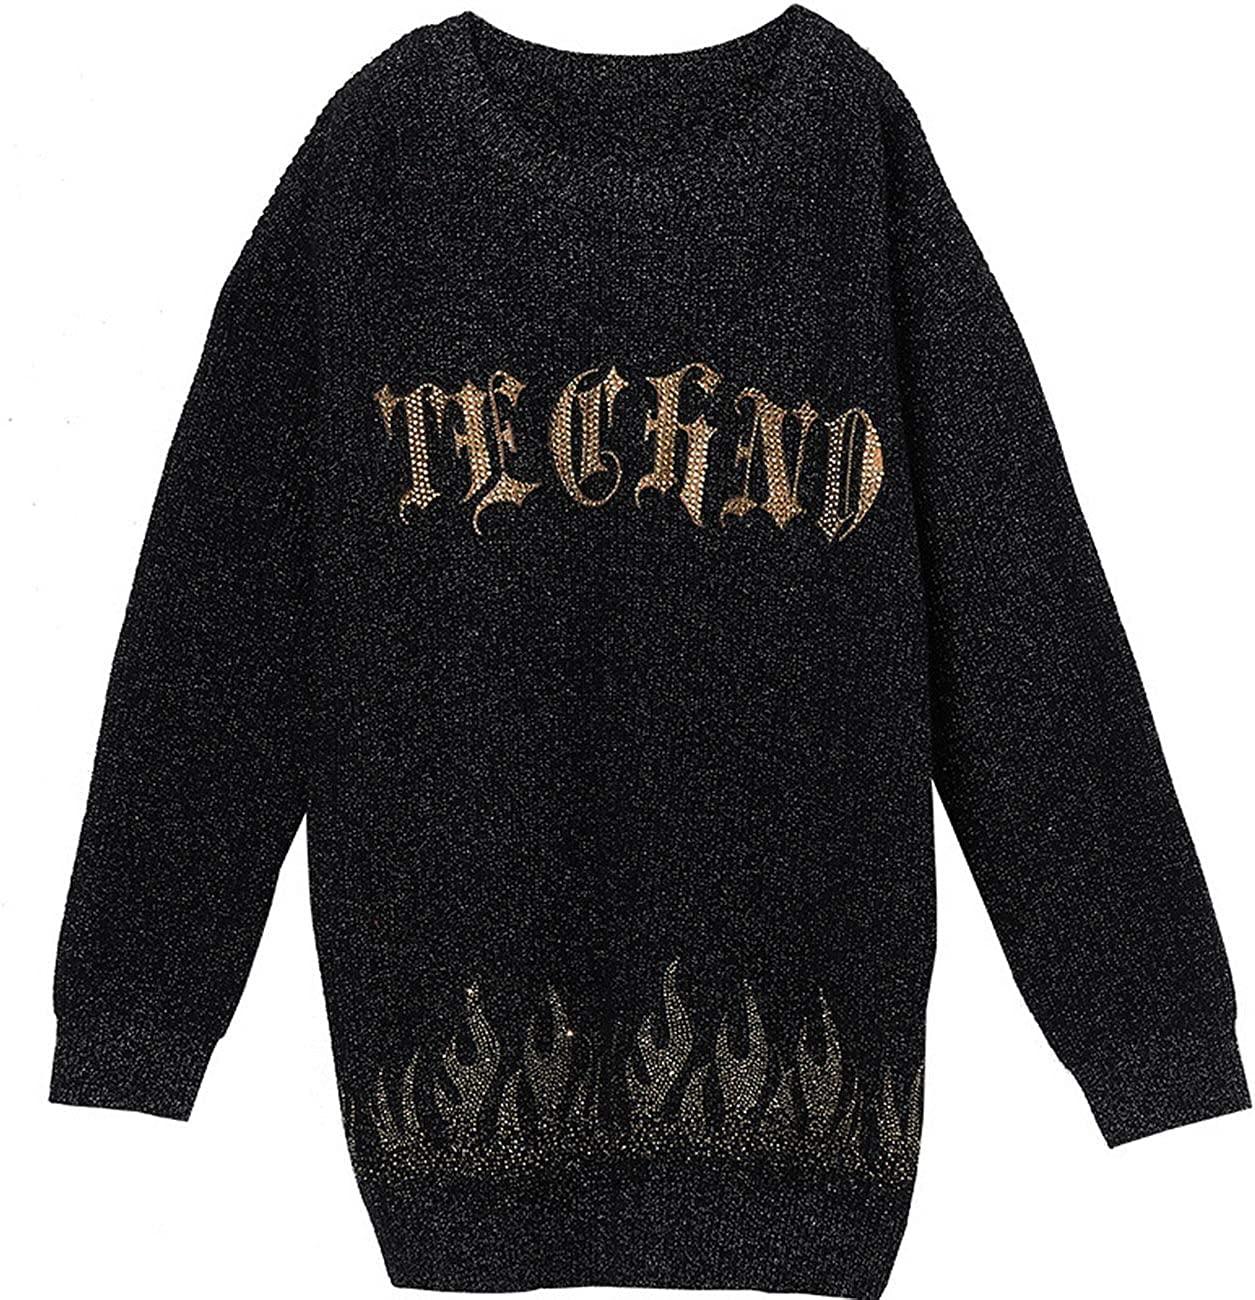 Light Luxury Tide Brand Big C hot Beads Sweater T203093005